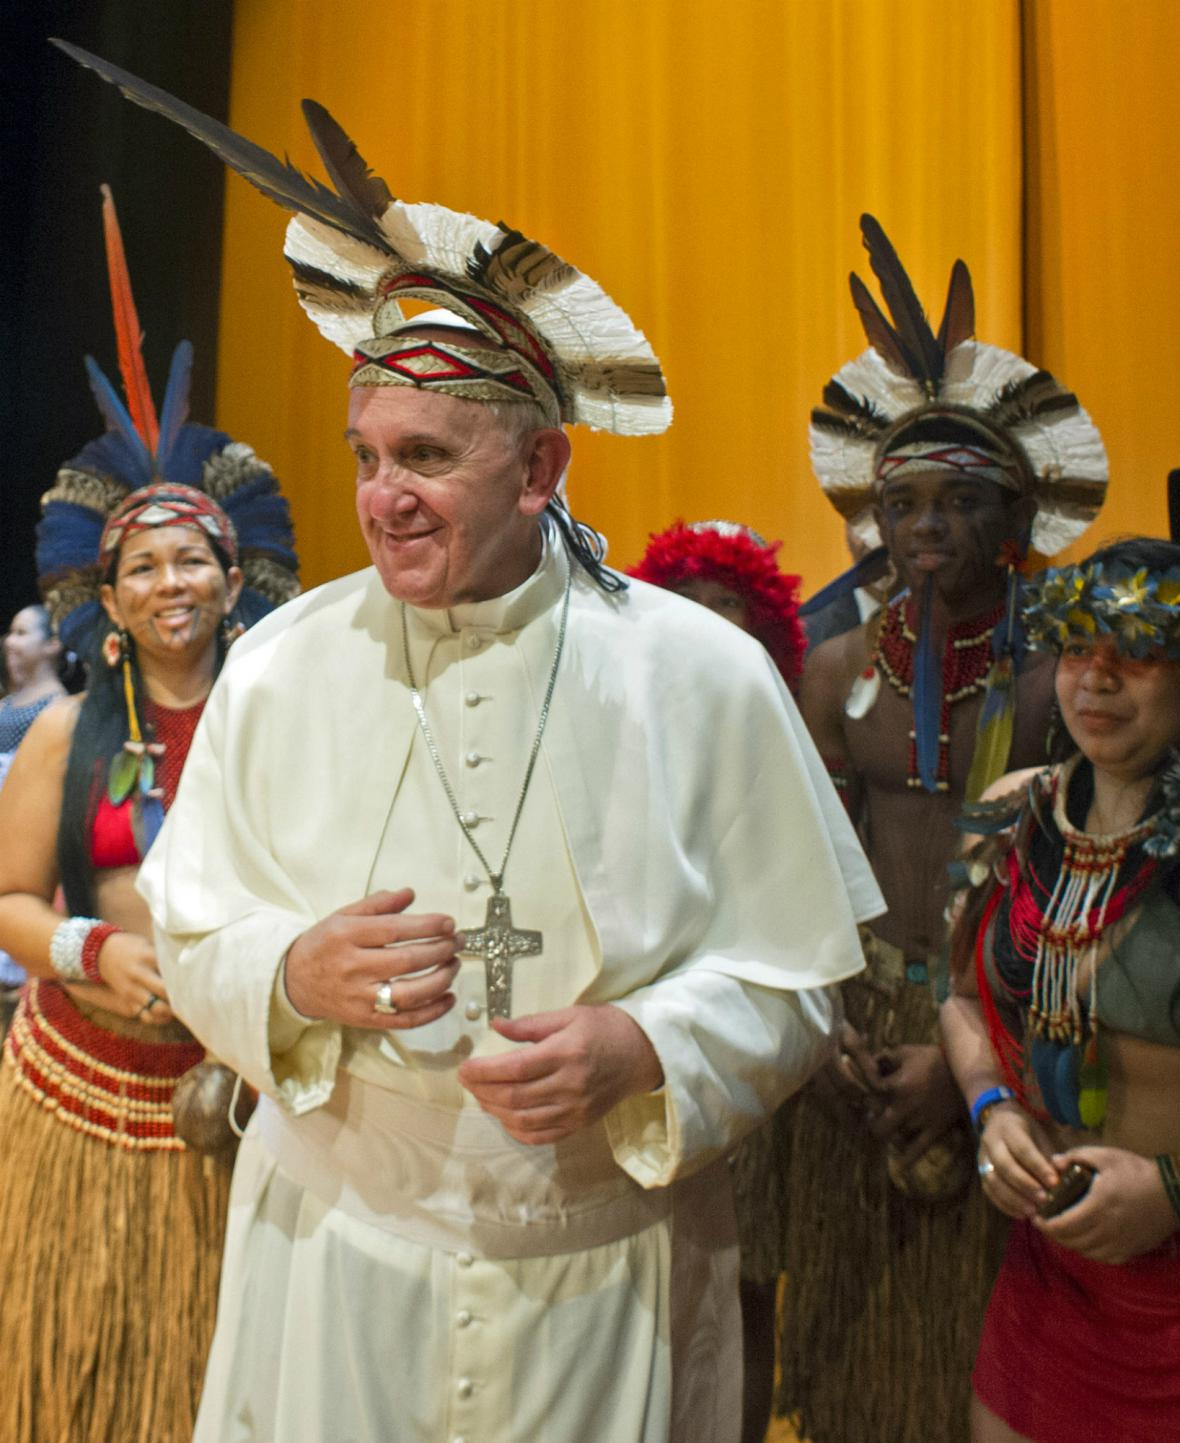 František dostal od členů kmene Pataxo čelenku